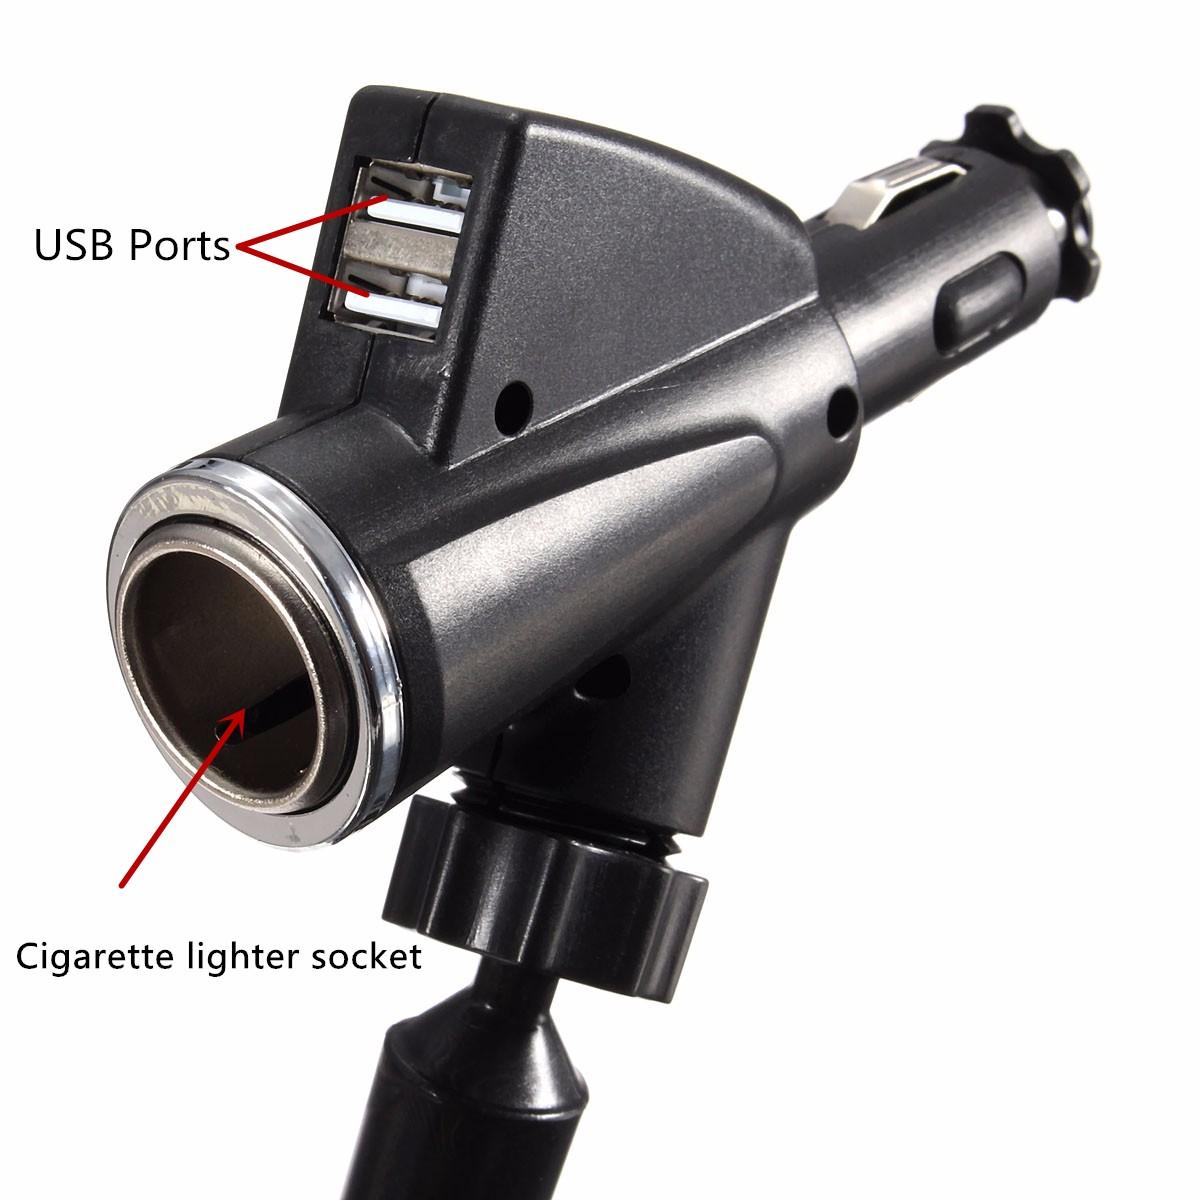 DURAGADGET Câble USB + Chargeur Allume-Cigare Double Prise